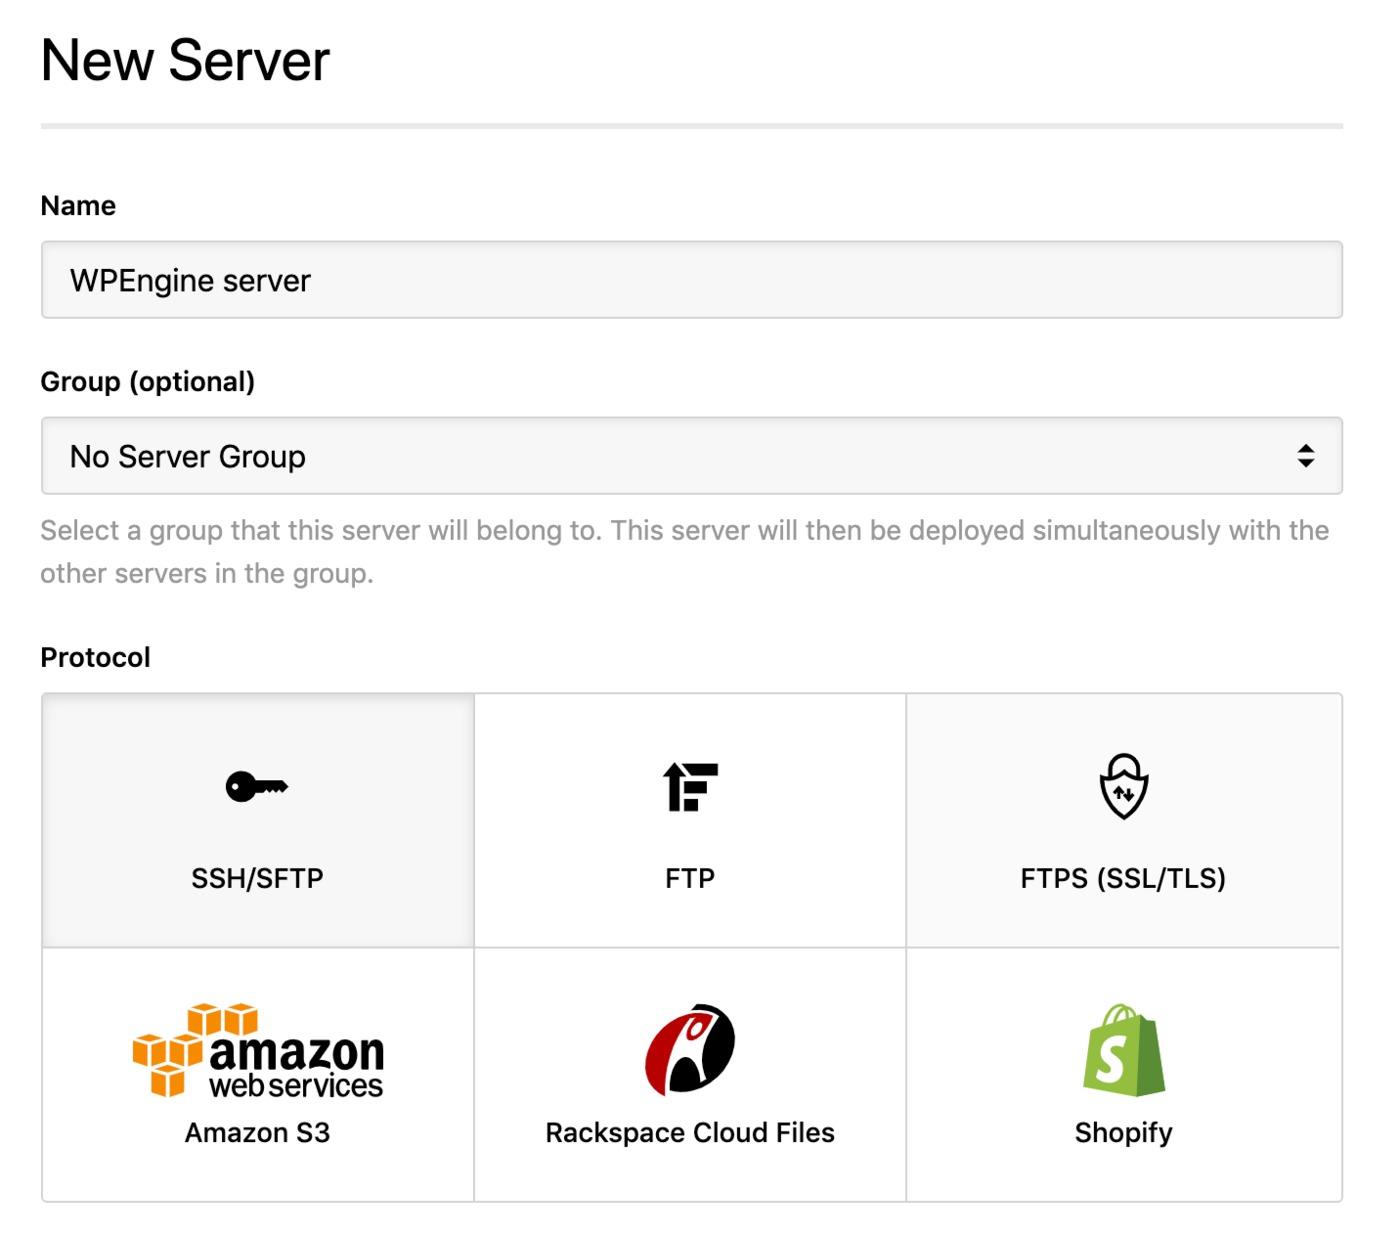 WPEngine - new server